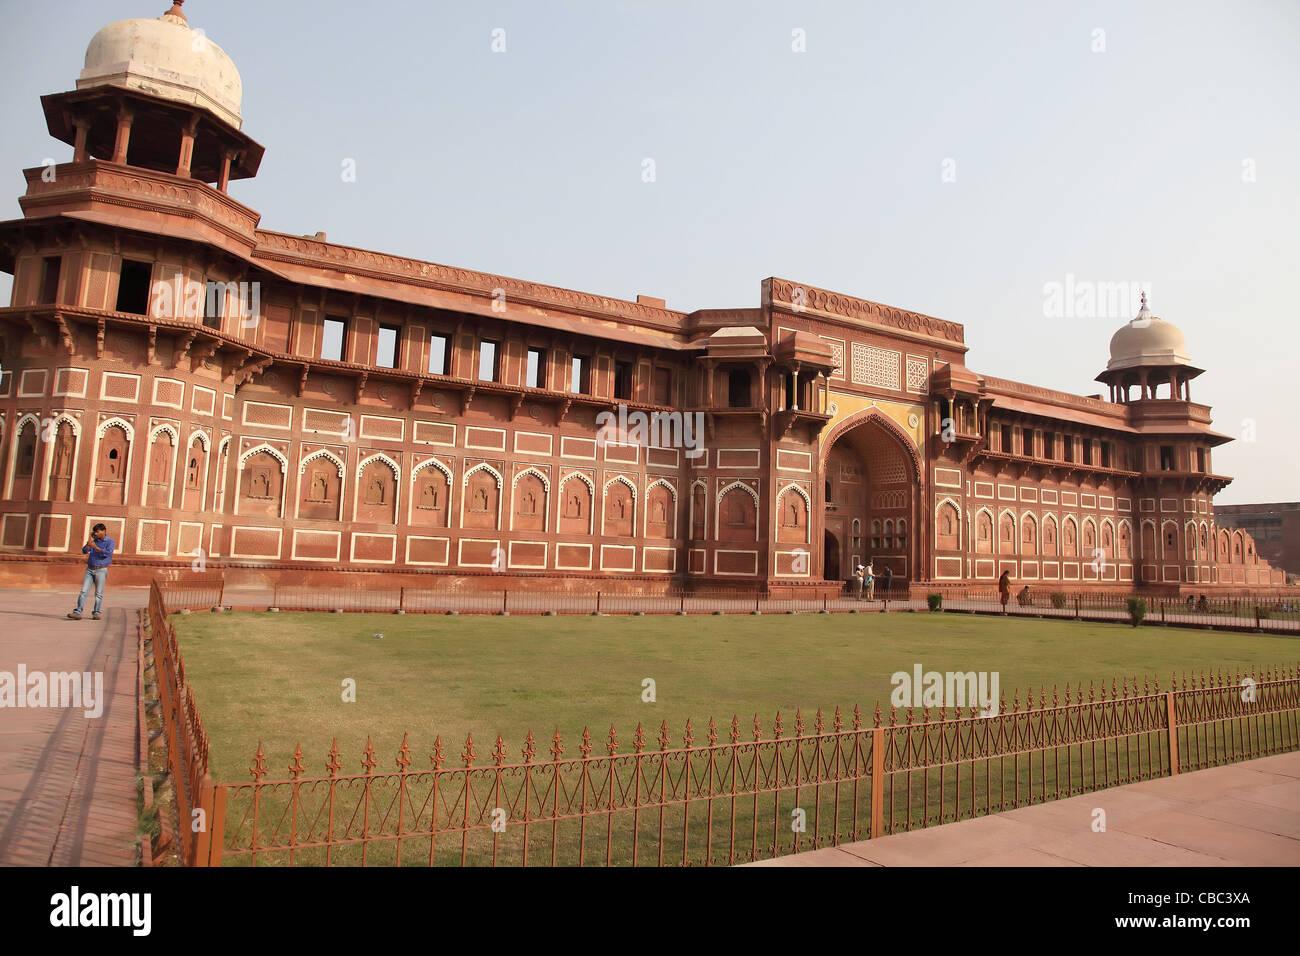 indo islamic architecture stock photos indo islamic architecture